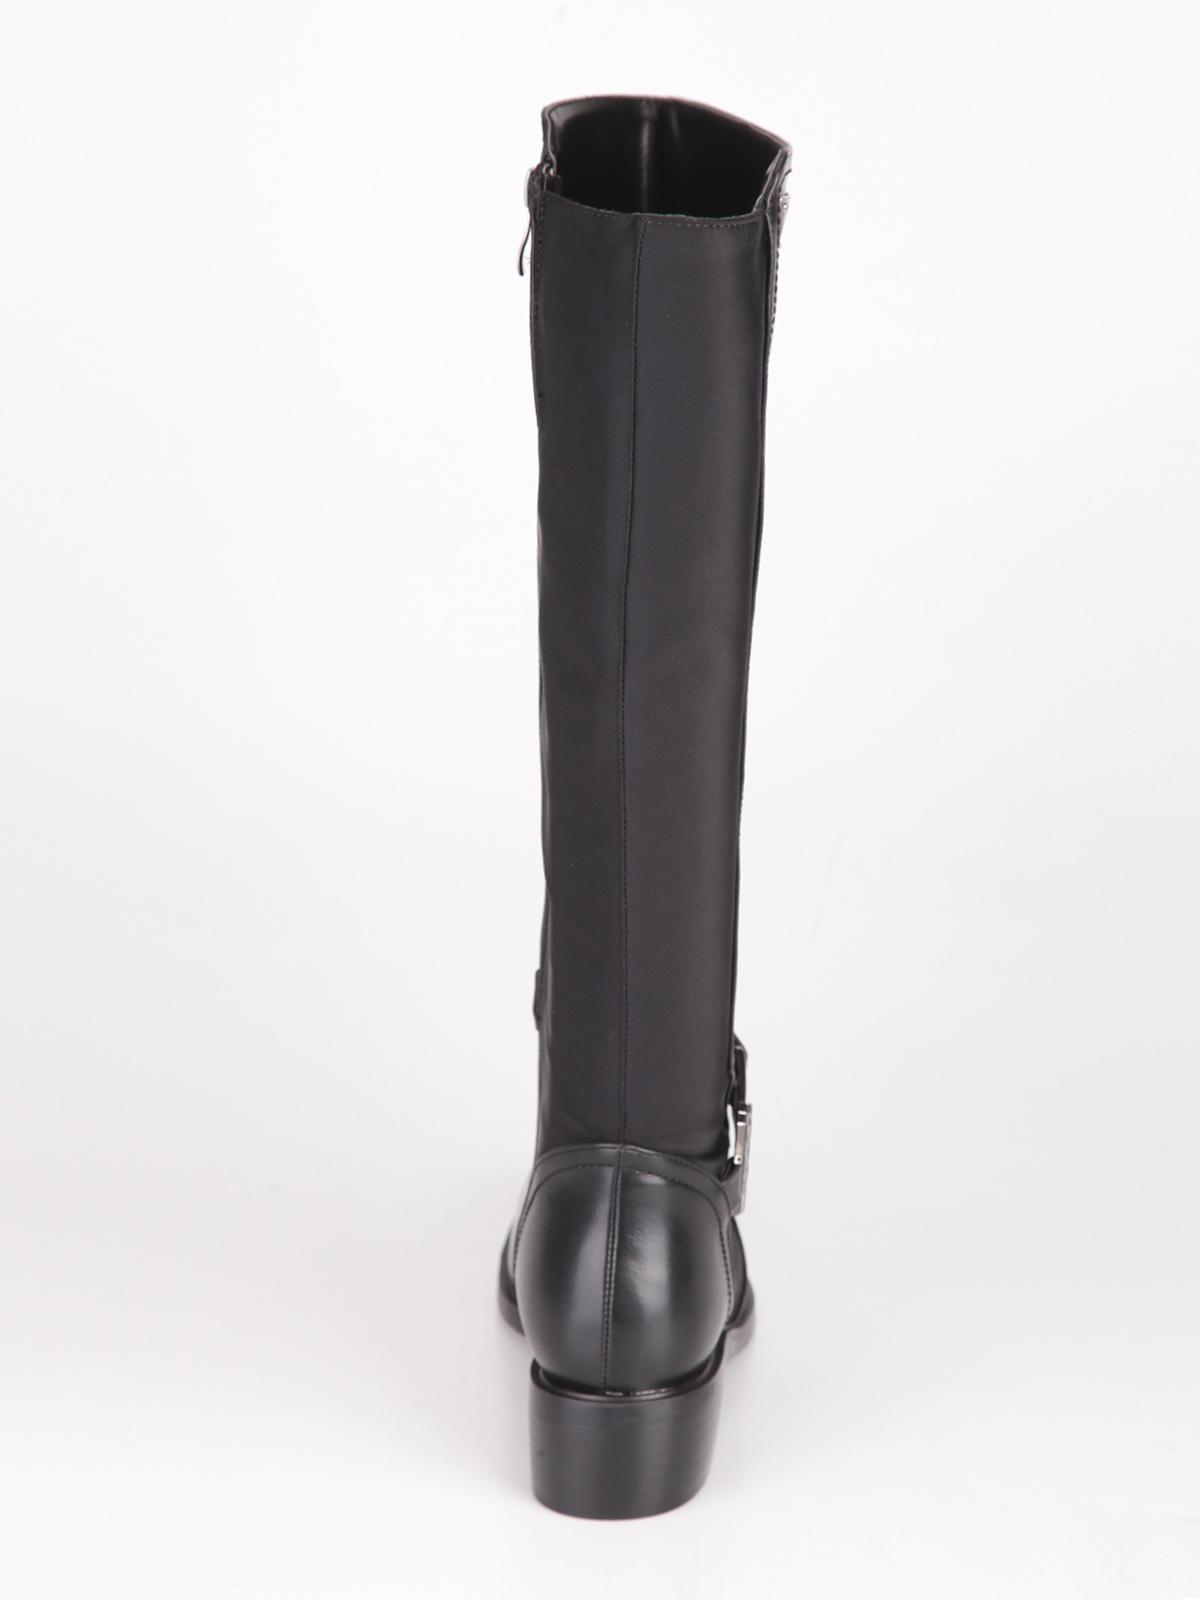 presentación amplia gama precio inmejorable Botas altas con tacón bajo mujer | MecShopping